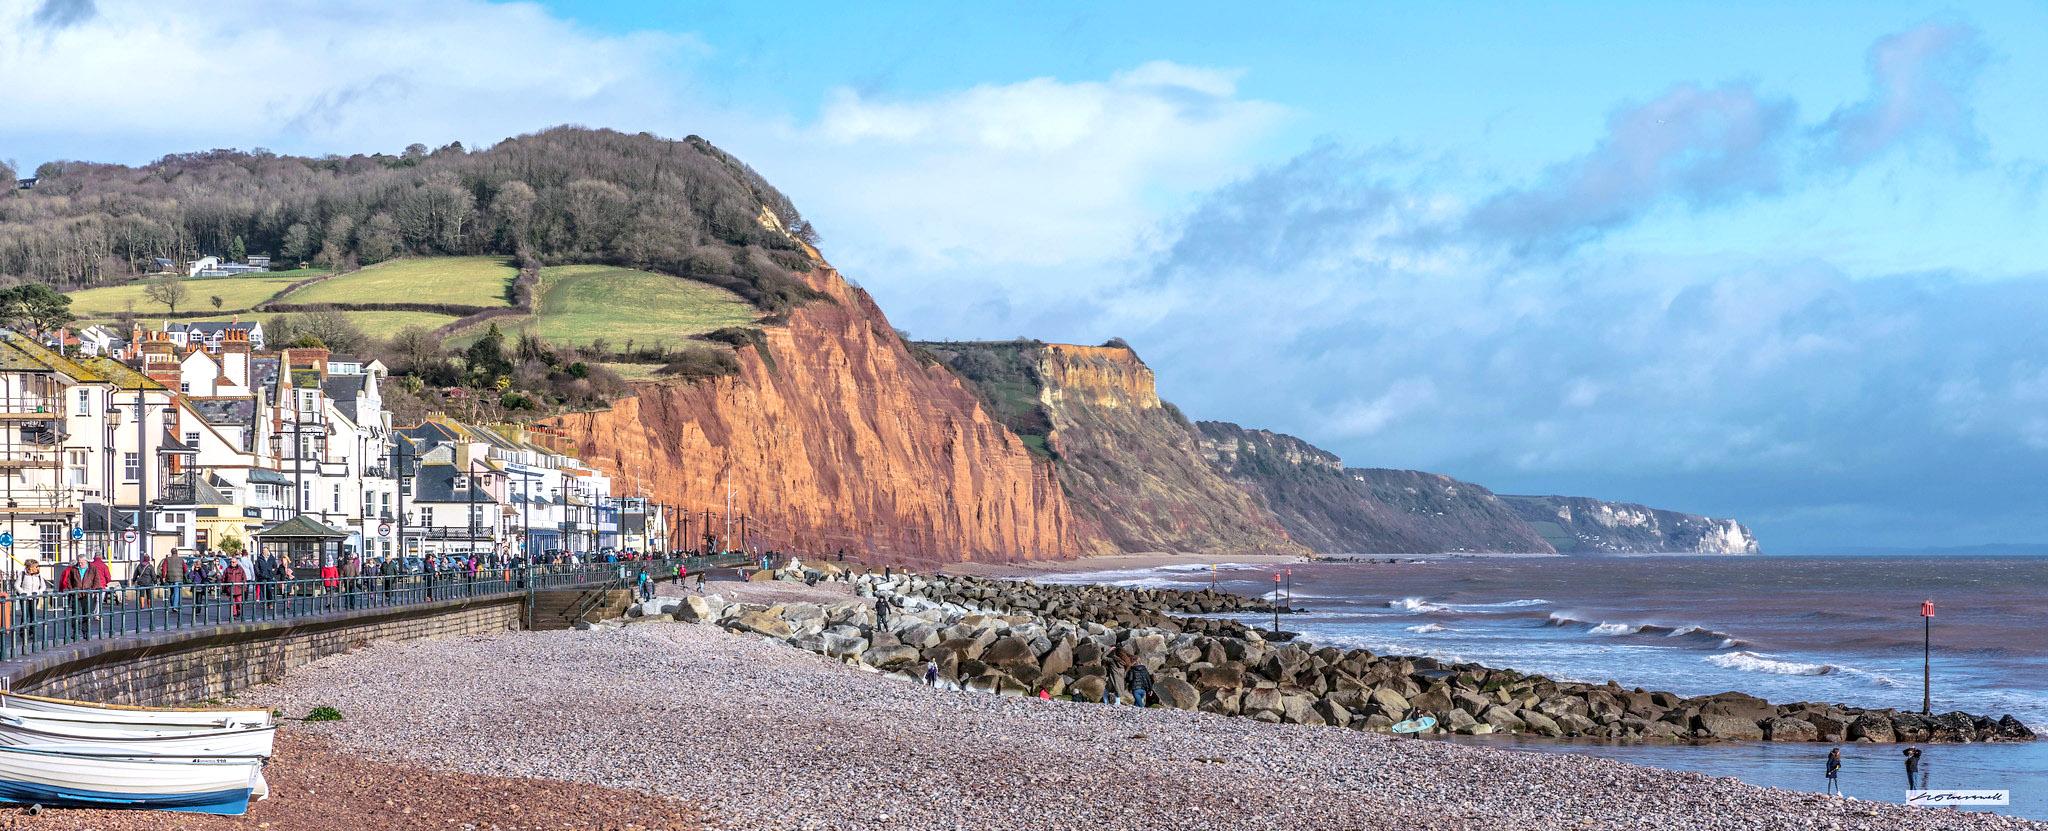 Sidmouth, Jurassic Coast, Devon by Neil Cresswell.jpg